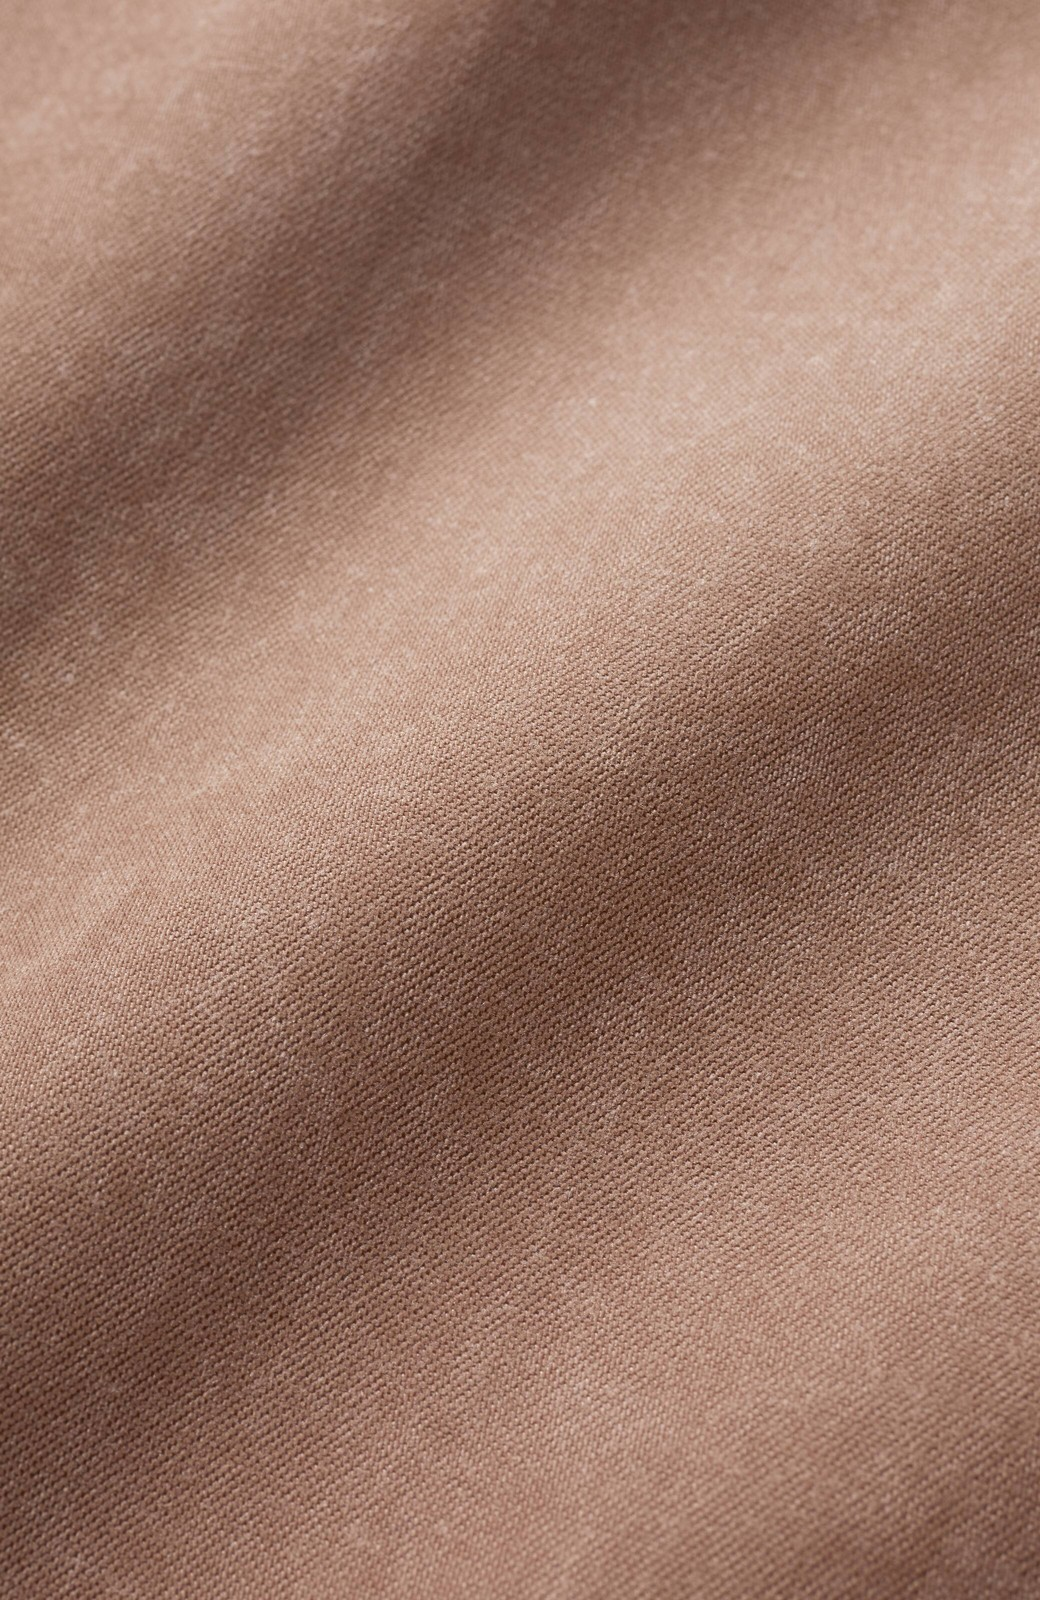 haco! 太ってもばれずに羽織っても便利なAラインワンピース <ブラウン>の商品写真4